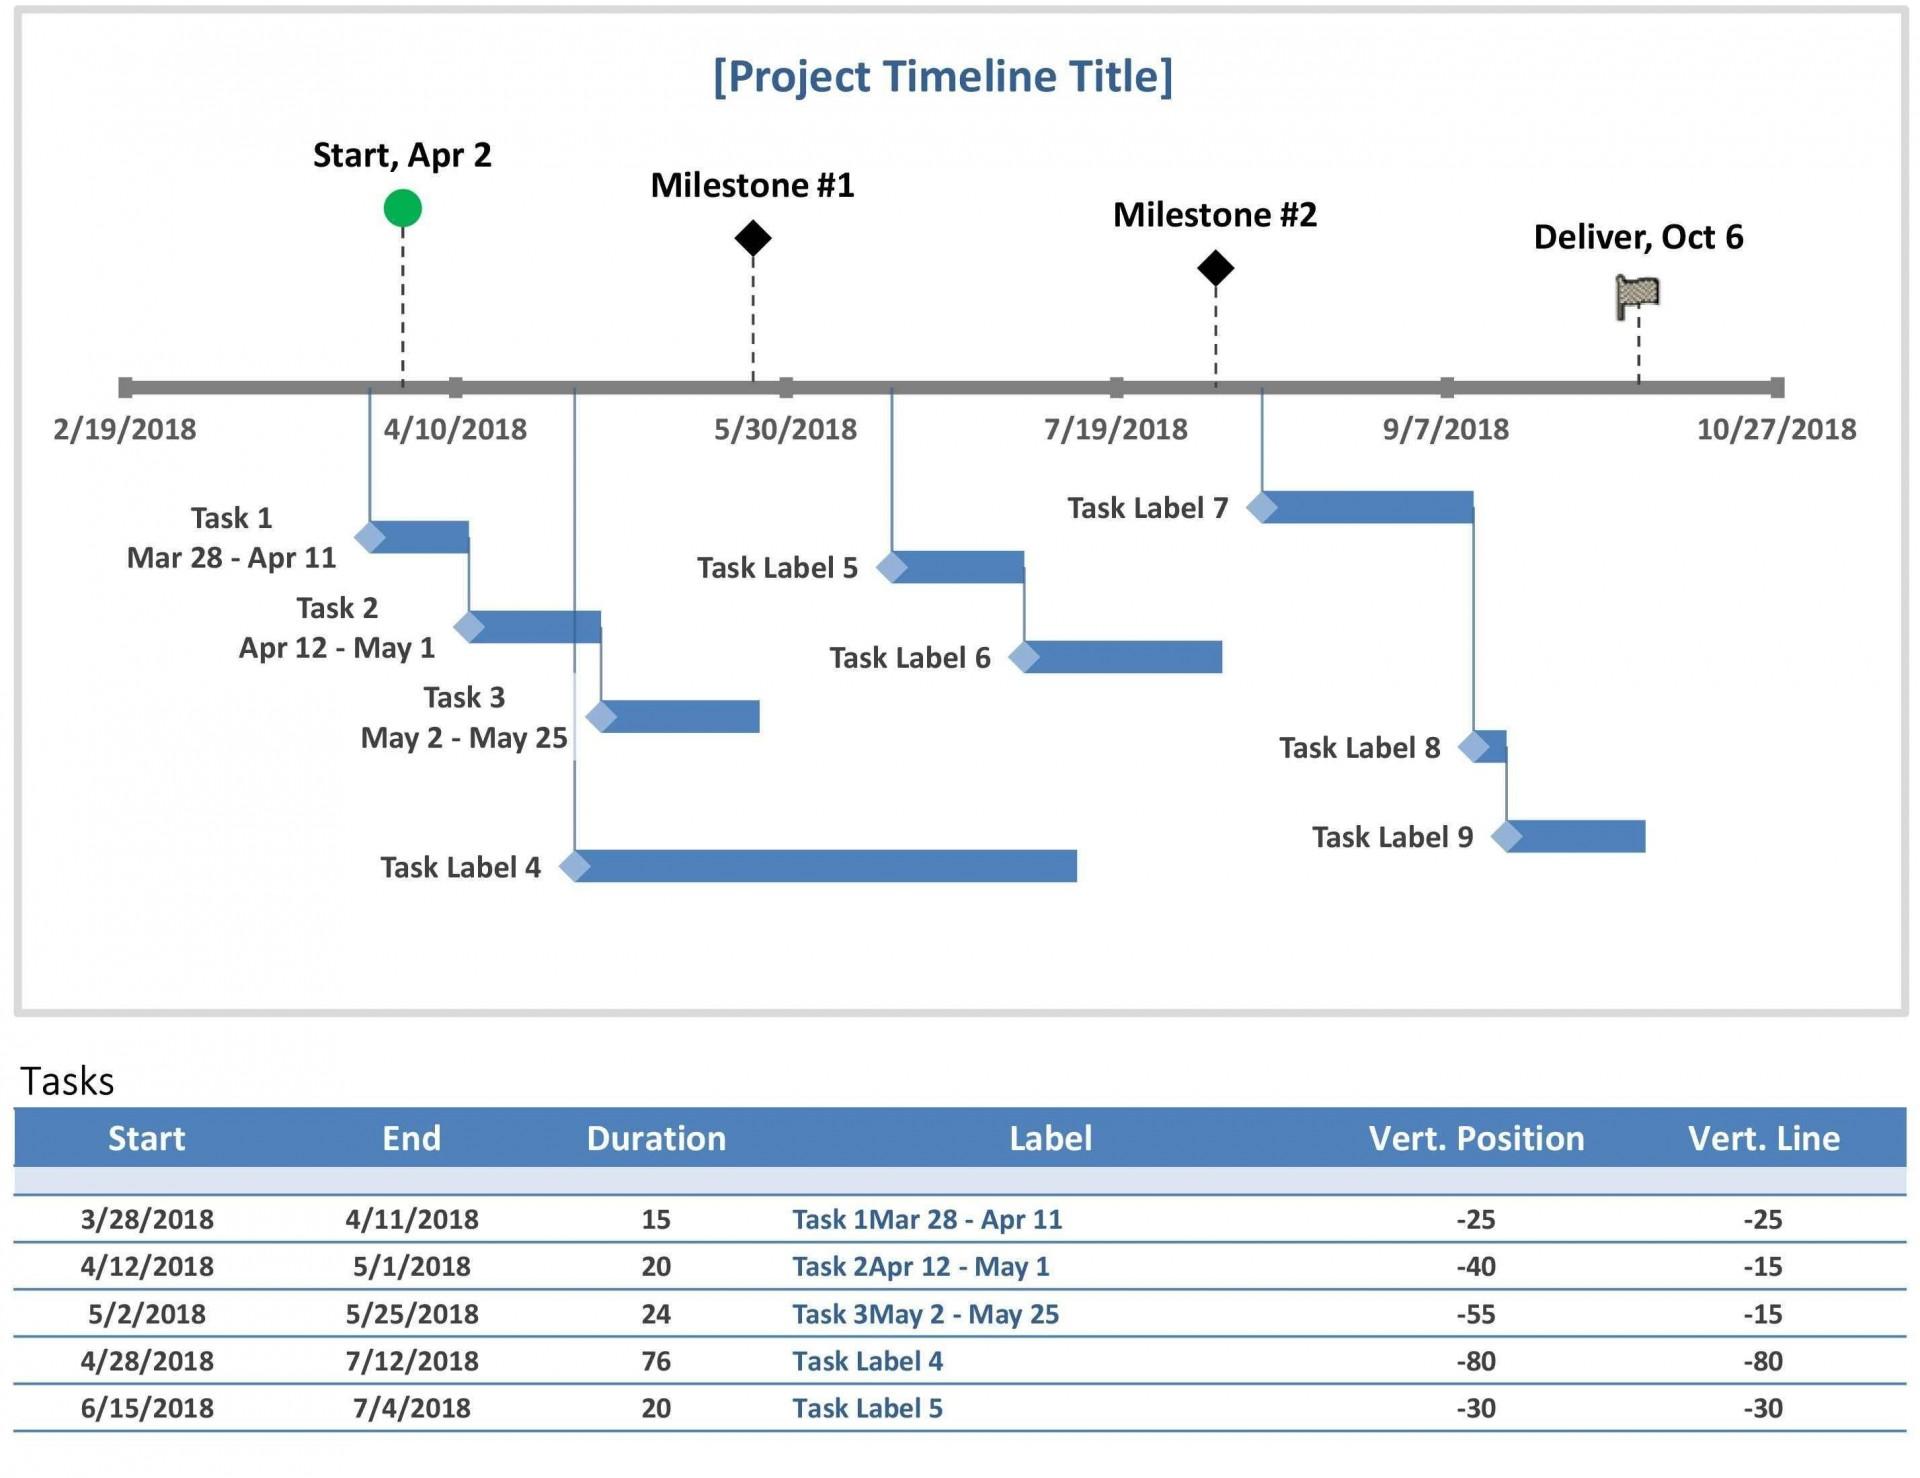 003 Unforgettable Project Management Timeline Template Design  Plan Pmbok Planner1920